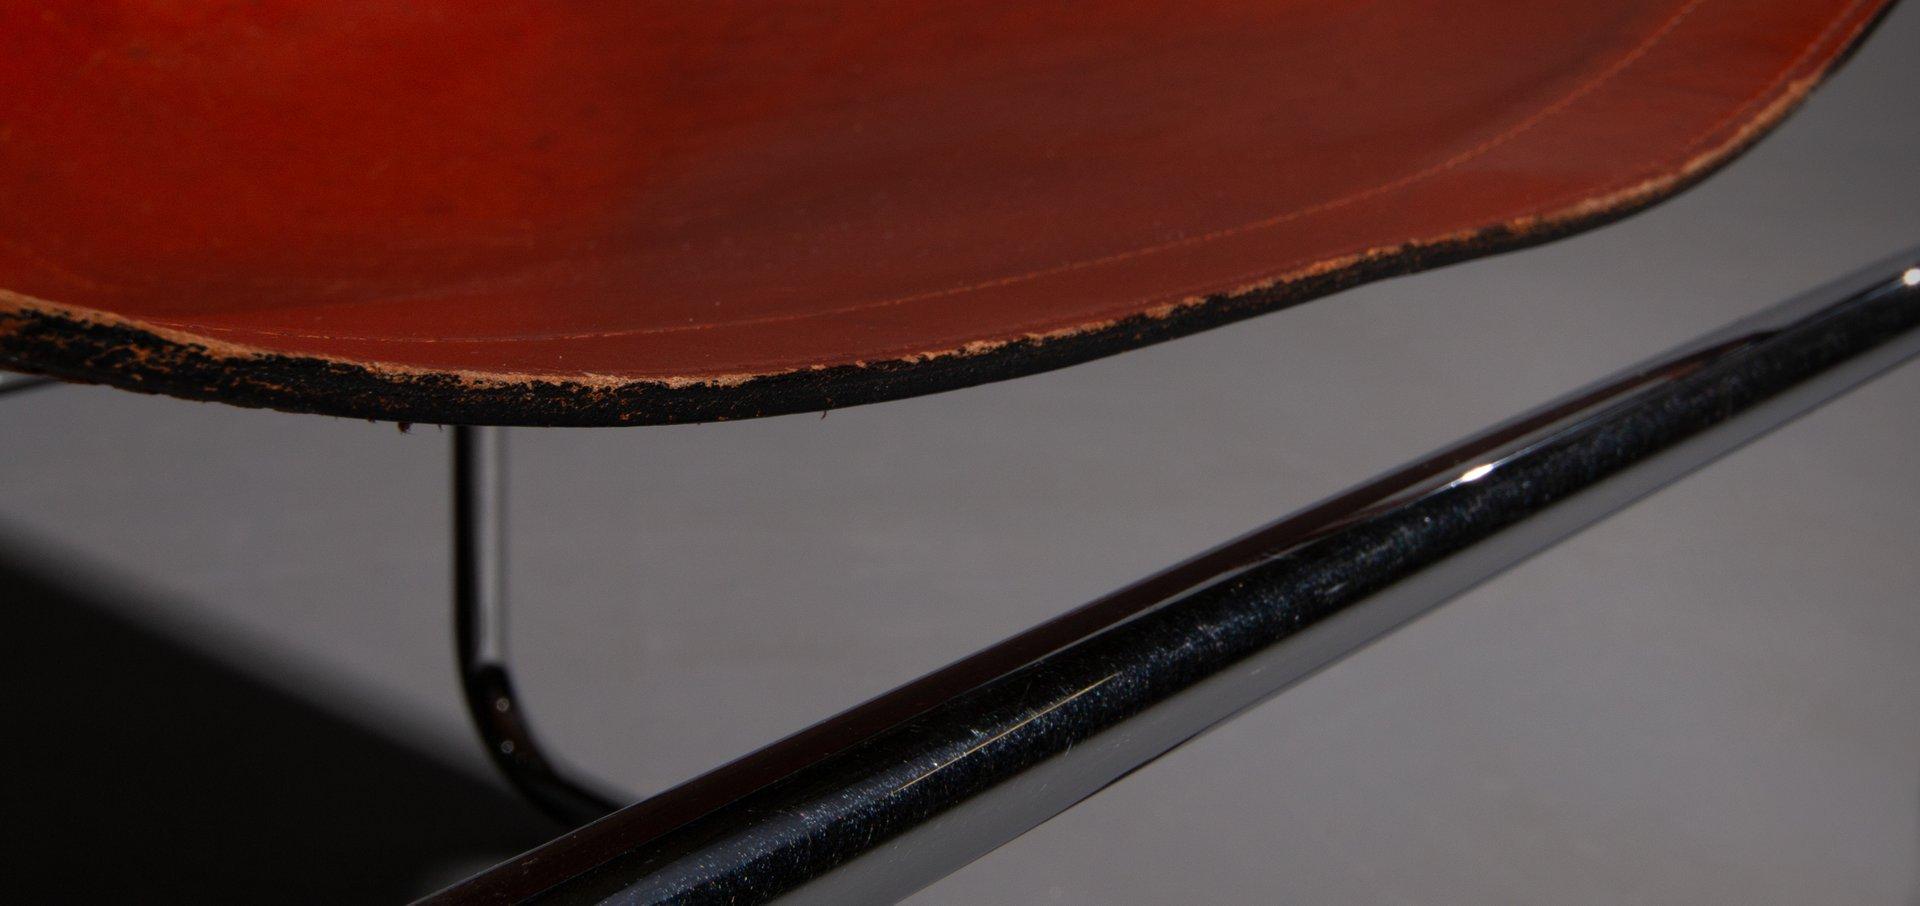 Vintage Stuhl Aus Rotbraunem Leder & Stahlrohr 1960er Bei